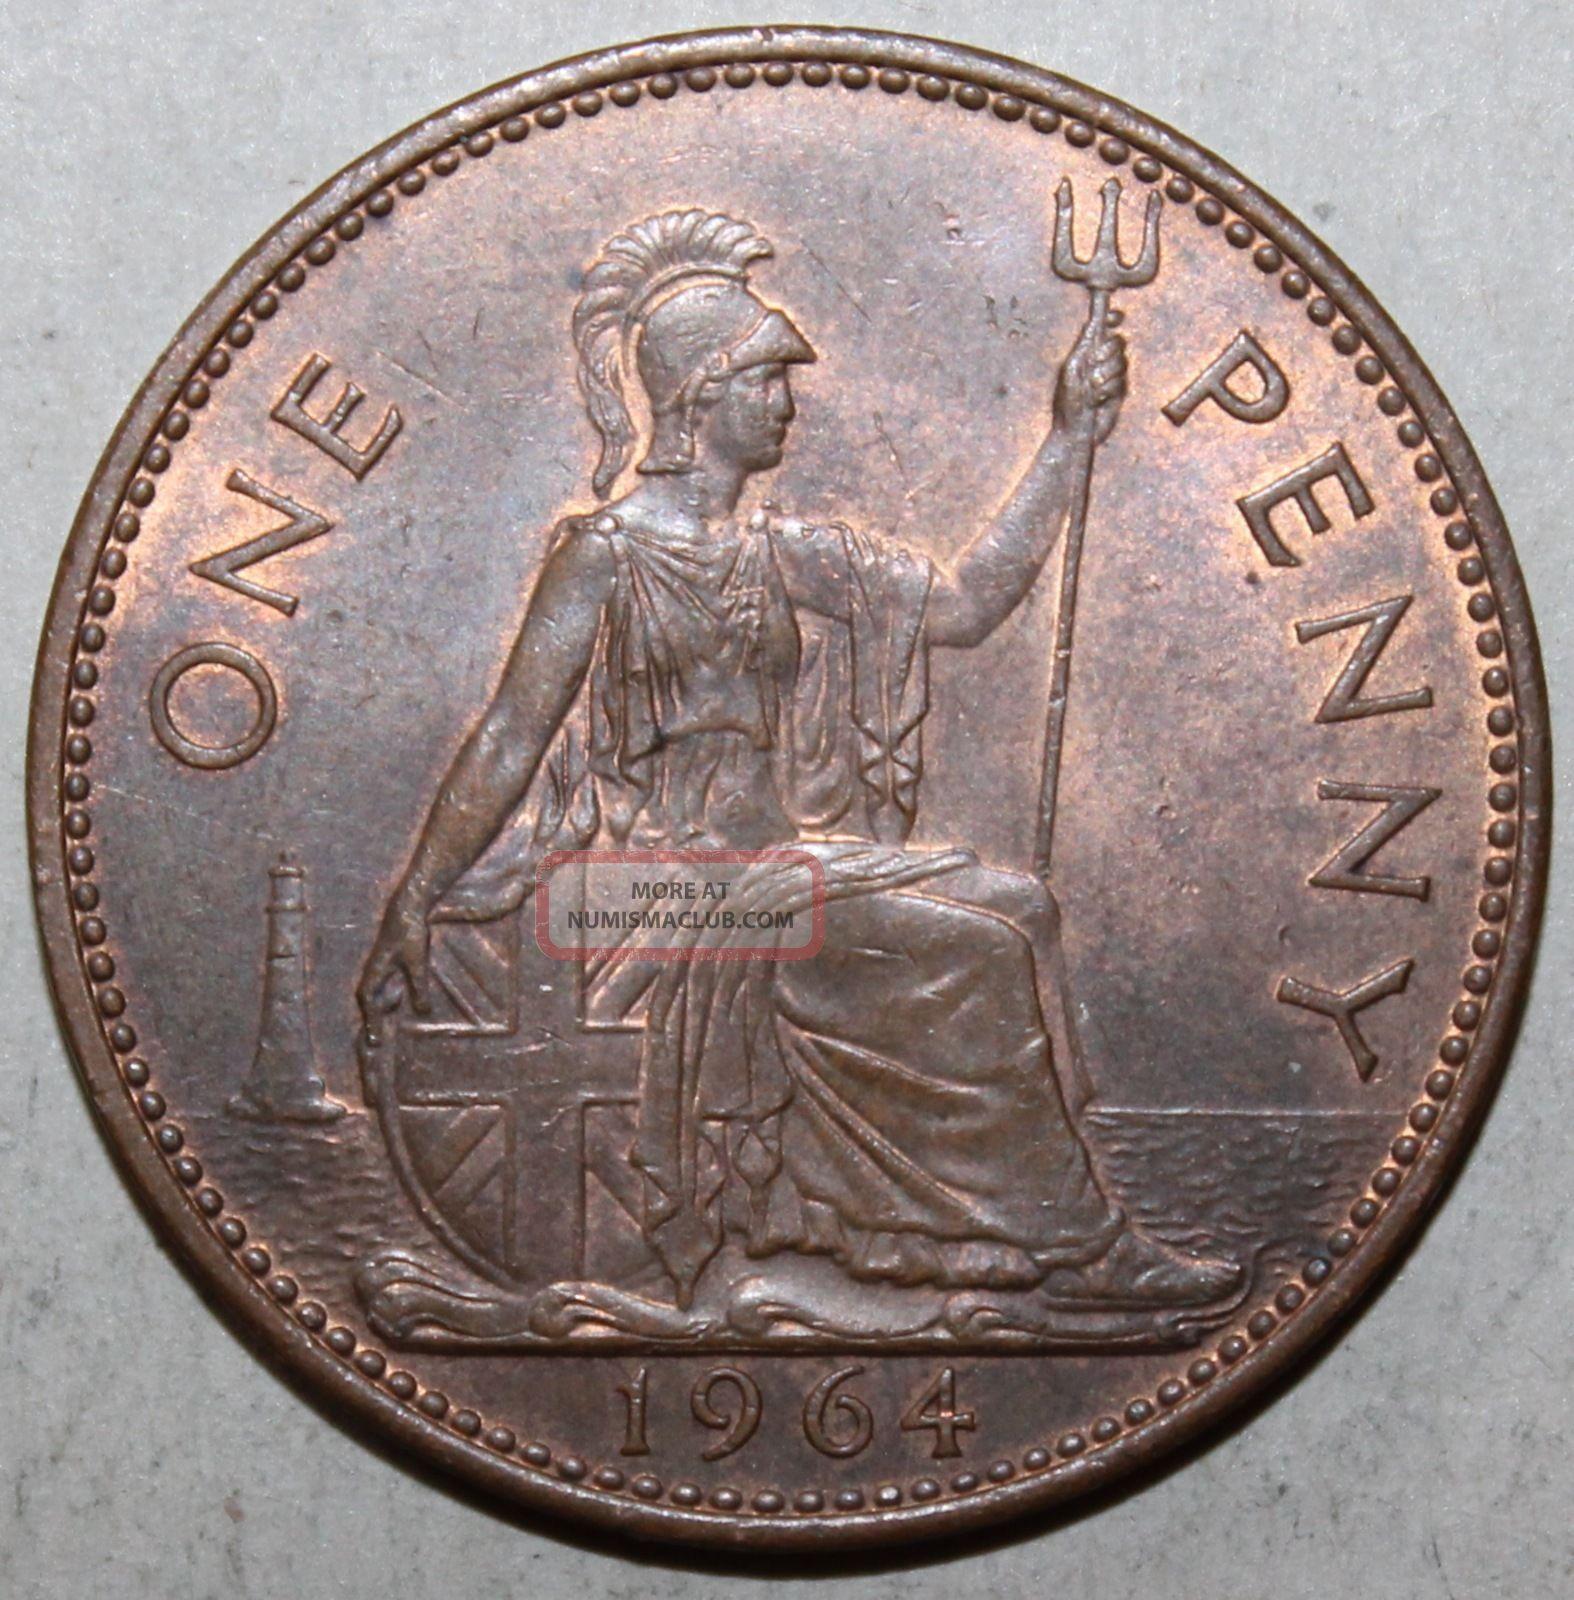 British Large Penny Coin 1964 Km 897 Elizabeth Ii United Kingdom Britain Uk